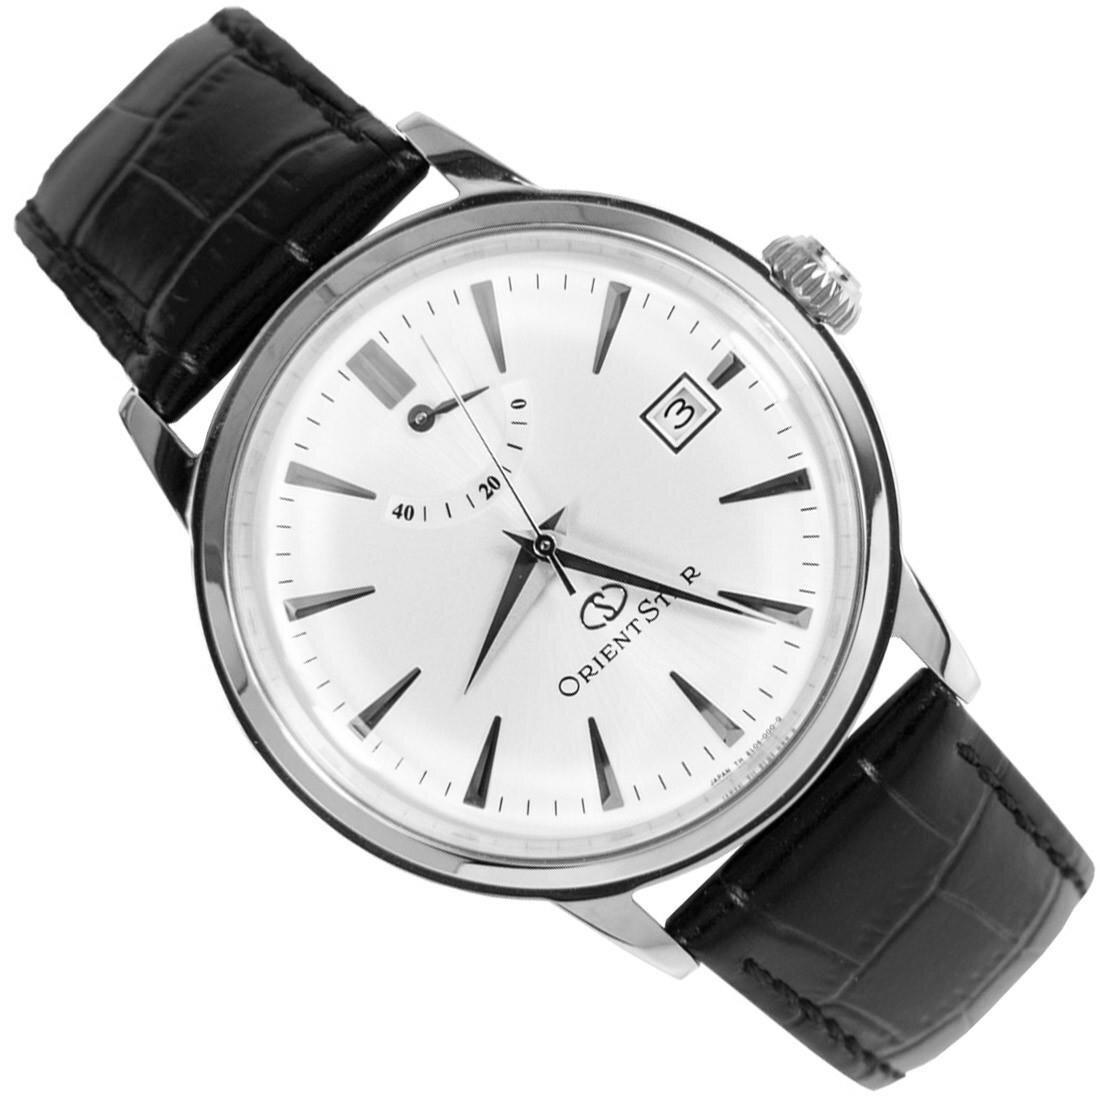 Đồng hồ nam Orient Star SEL05004W0